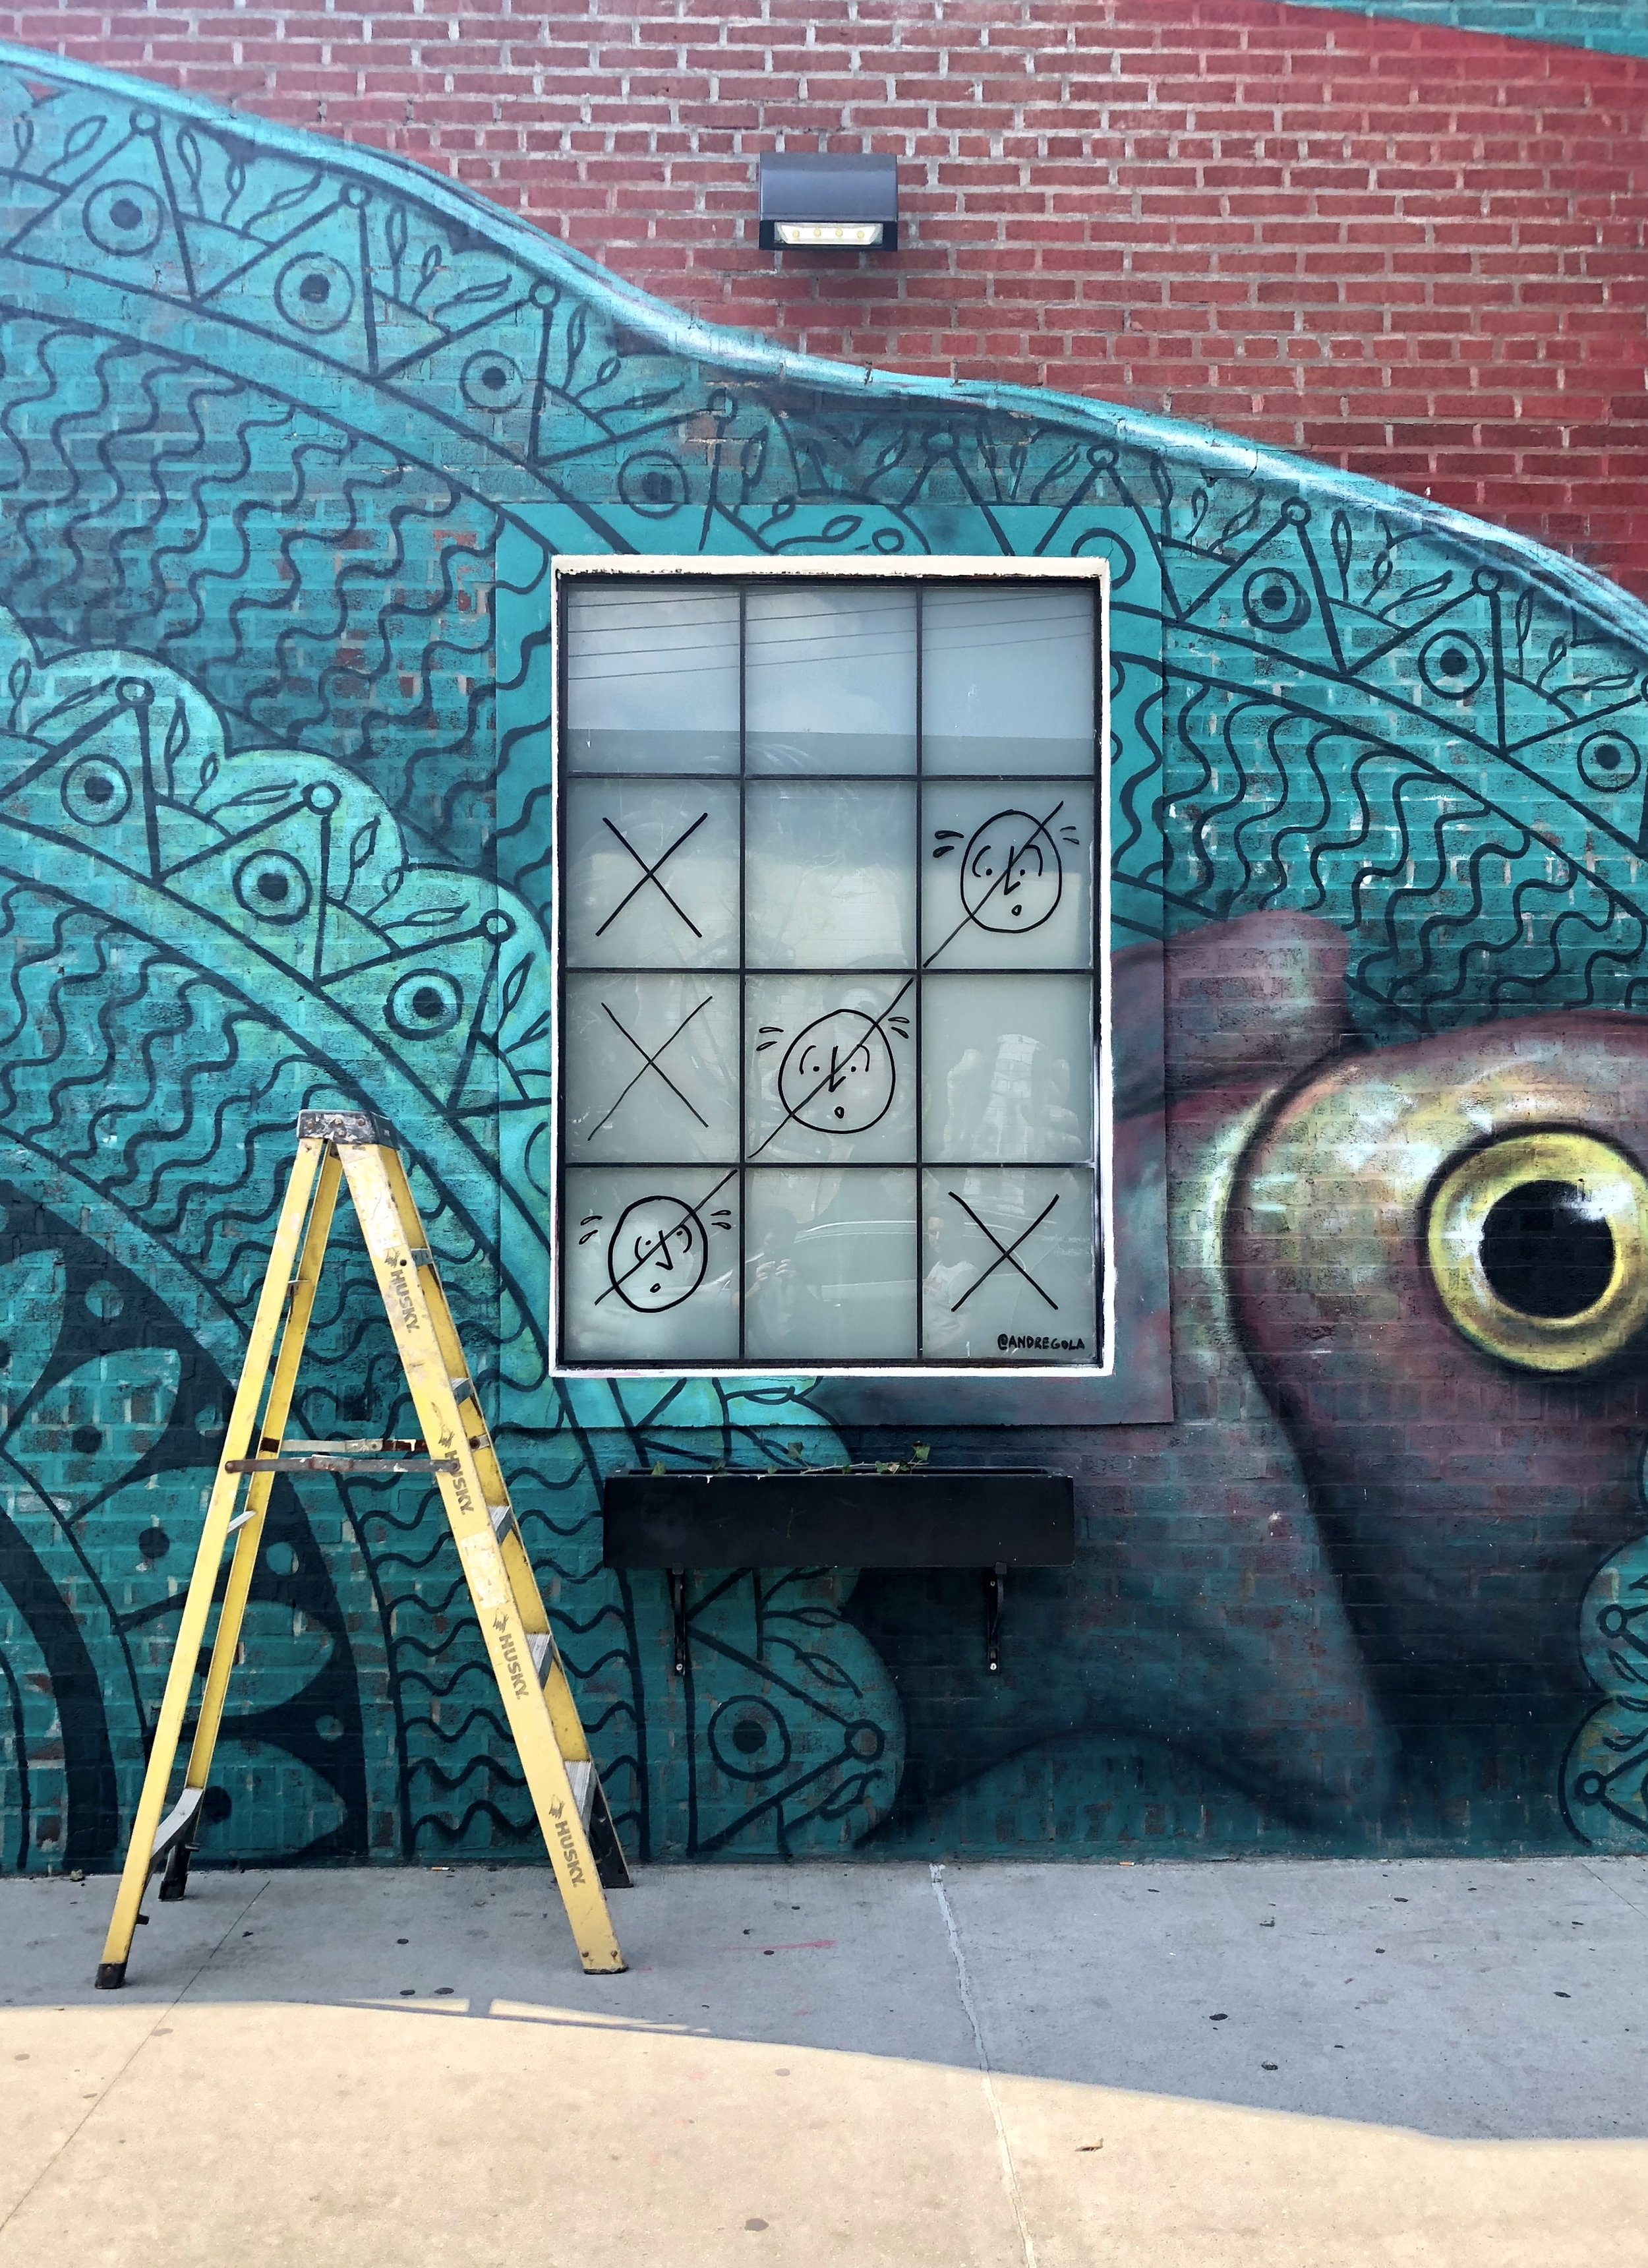 """Tic Tac Toe 01"", Bushwick, Brooklyn, NY, 2018"